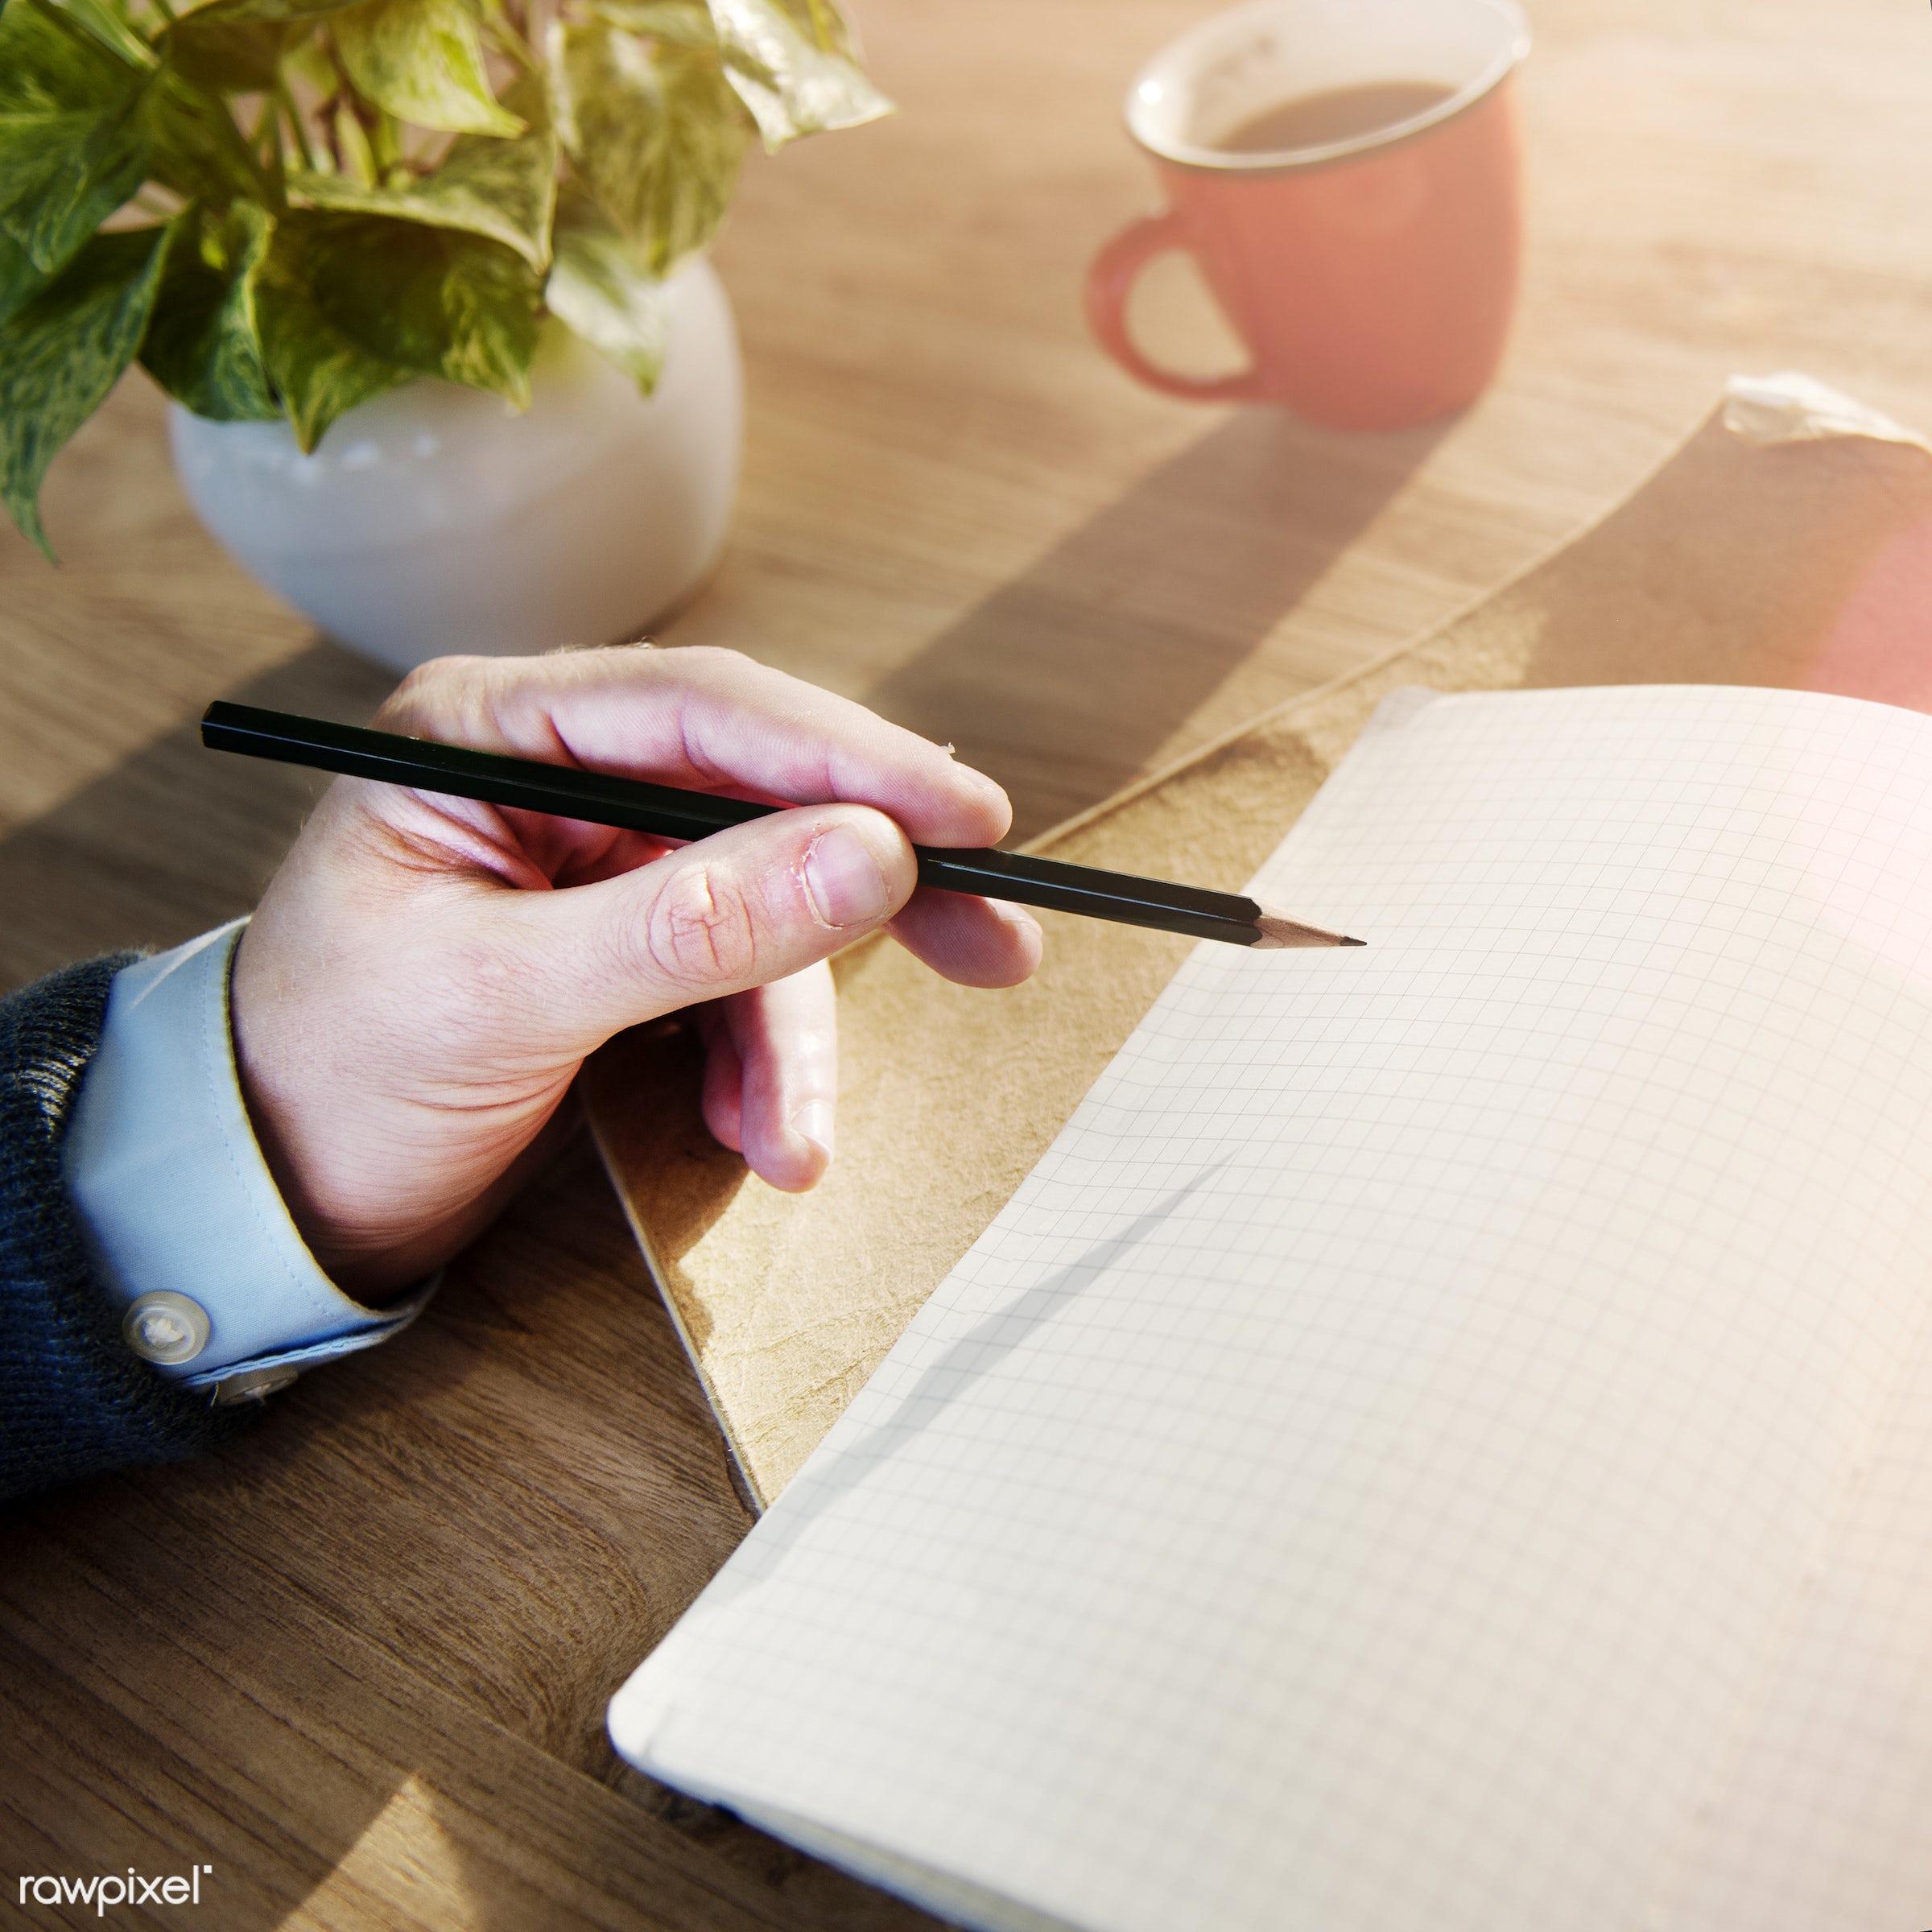 analyzing, blank, business, cafe, classroom, coffee, coffee break, college, copy space, designer, desk, education, hand,...